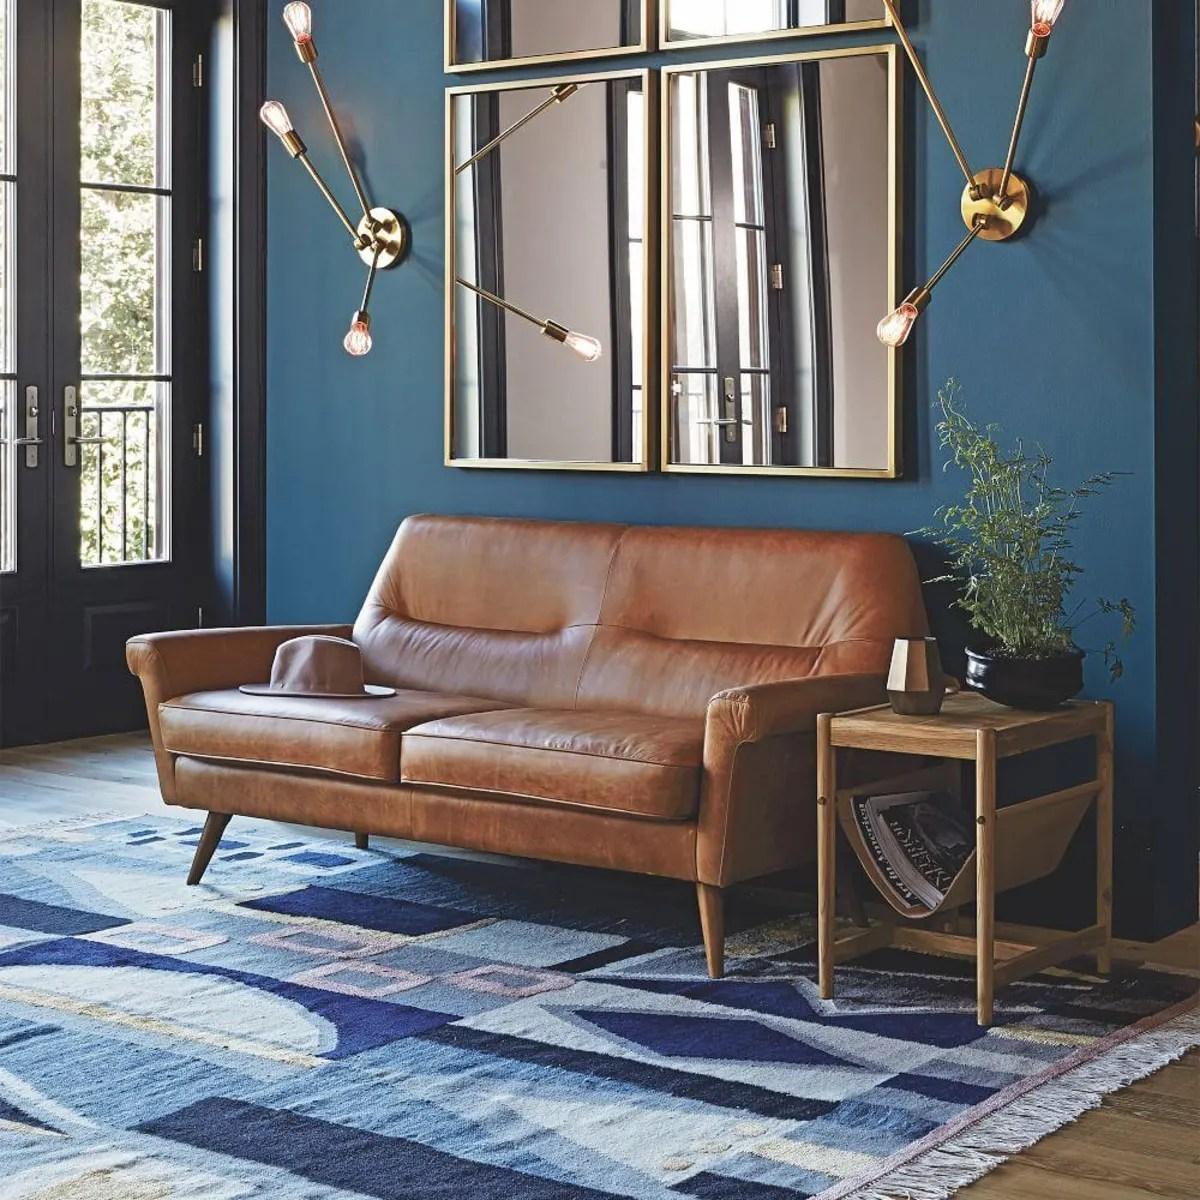 Best Small Living Room Design Ideas | Apartment Therapy on Small Space Small Living Room Ideas  id=56794